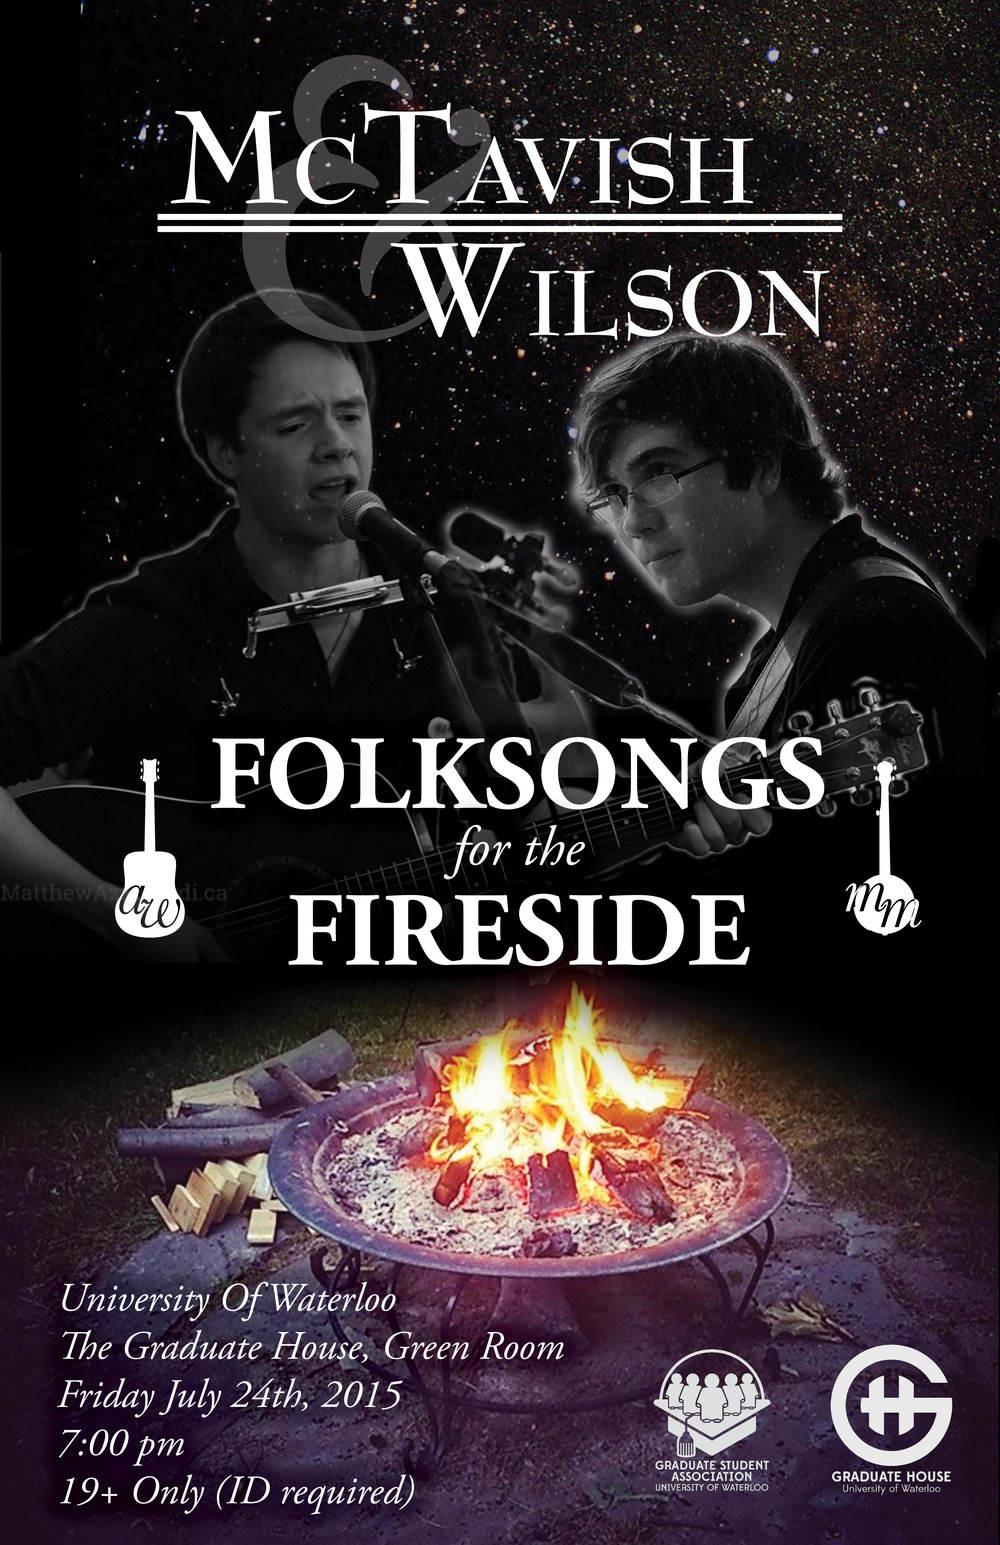 M&W_Folksongs4Fireside_Waterloo.jpg